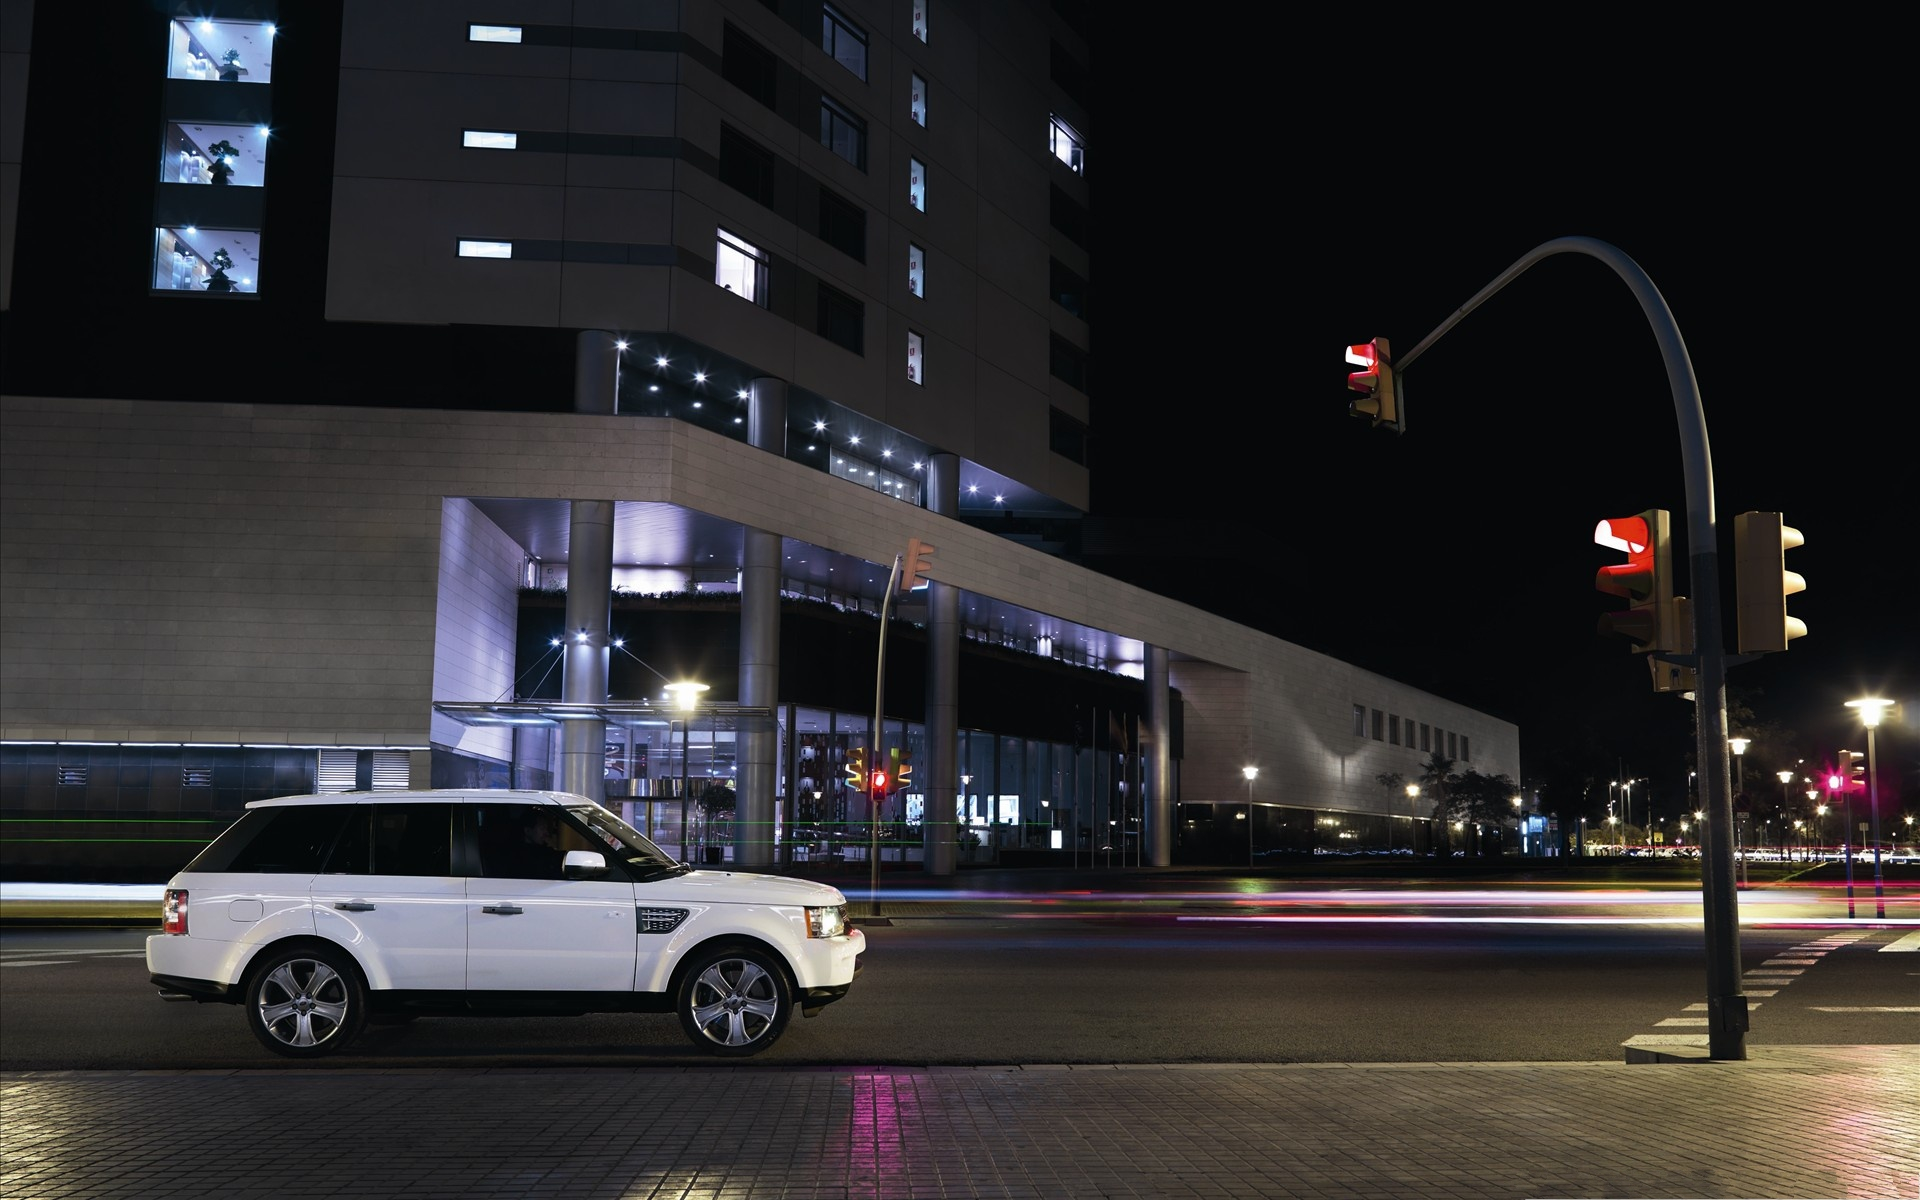 land rover evoque iphone wallpaper